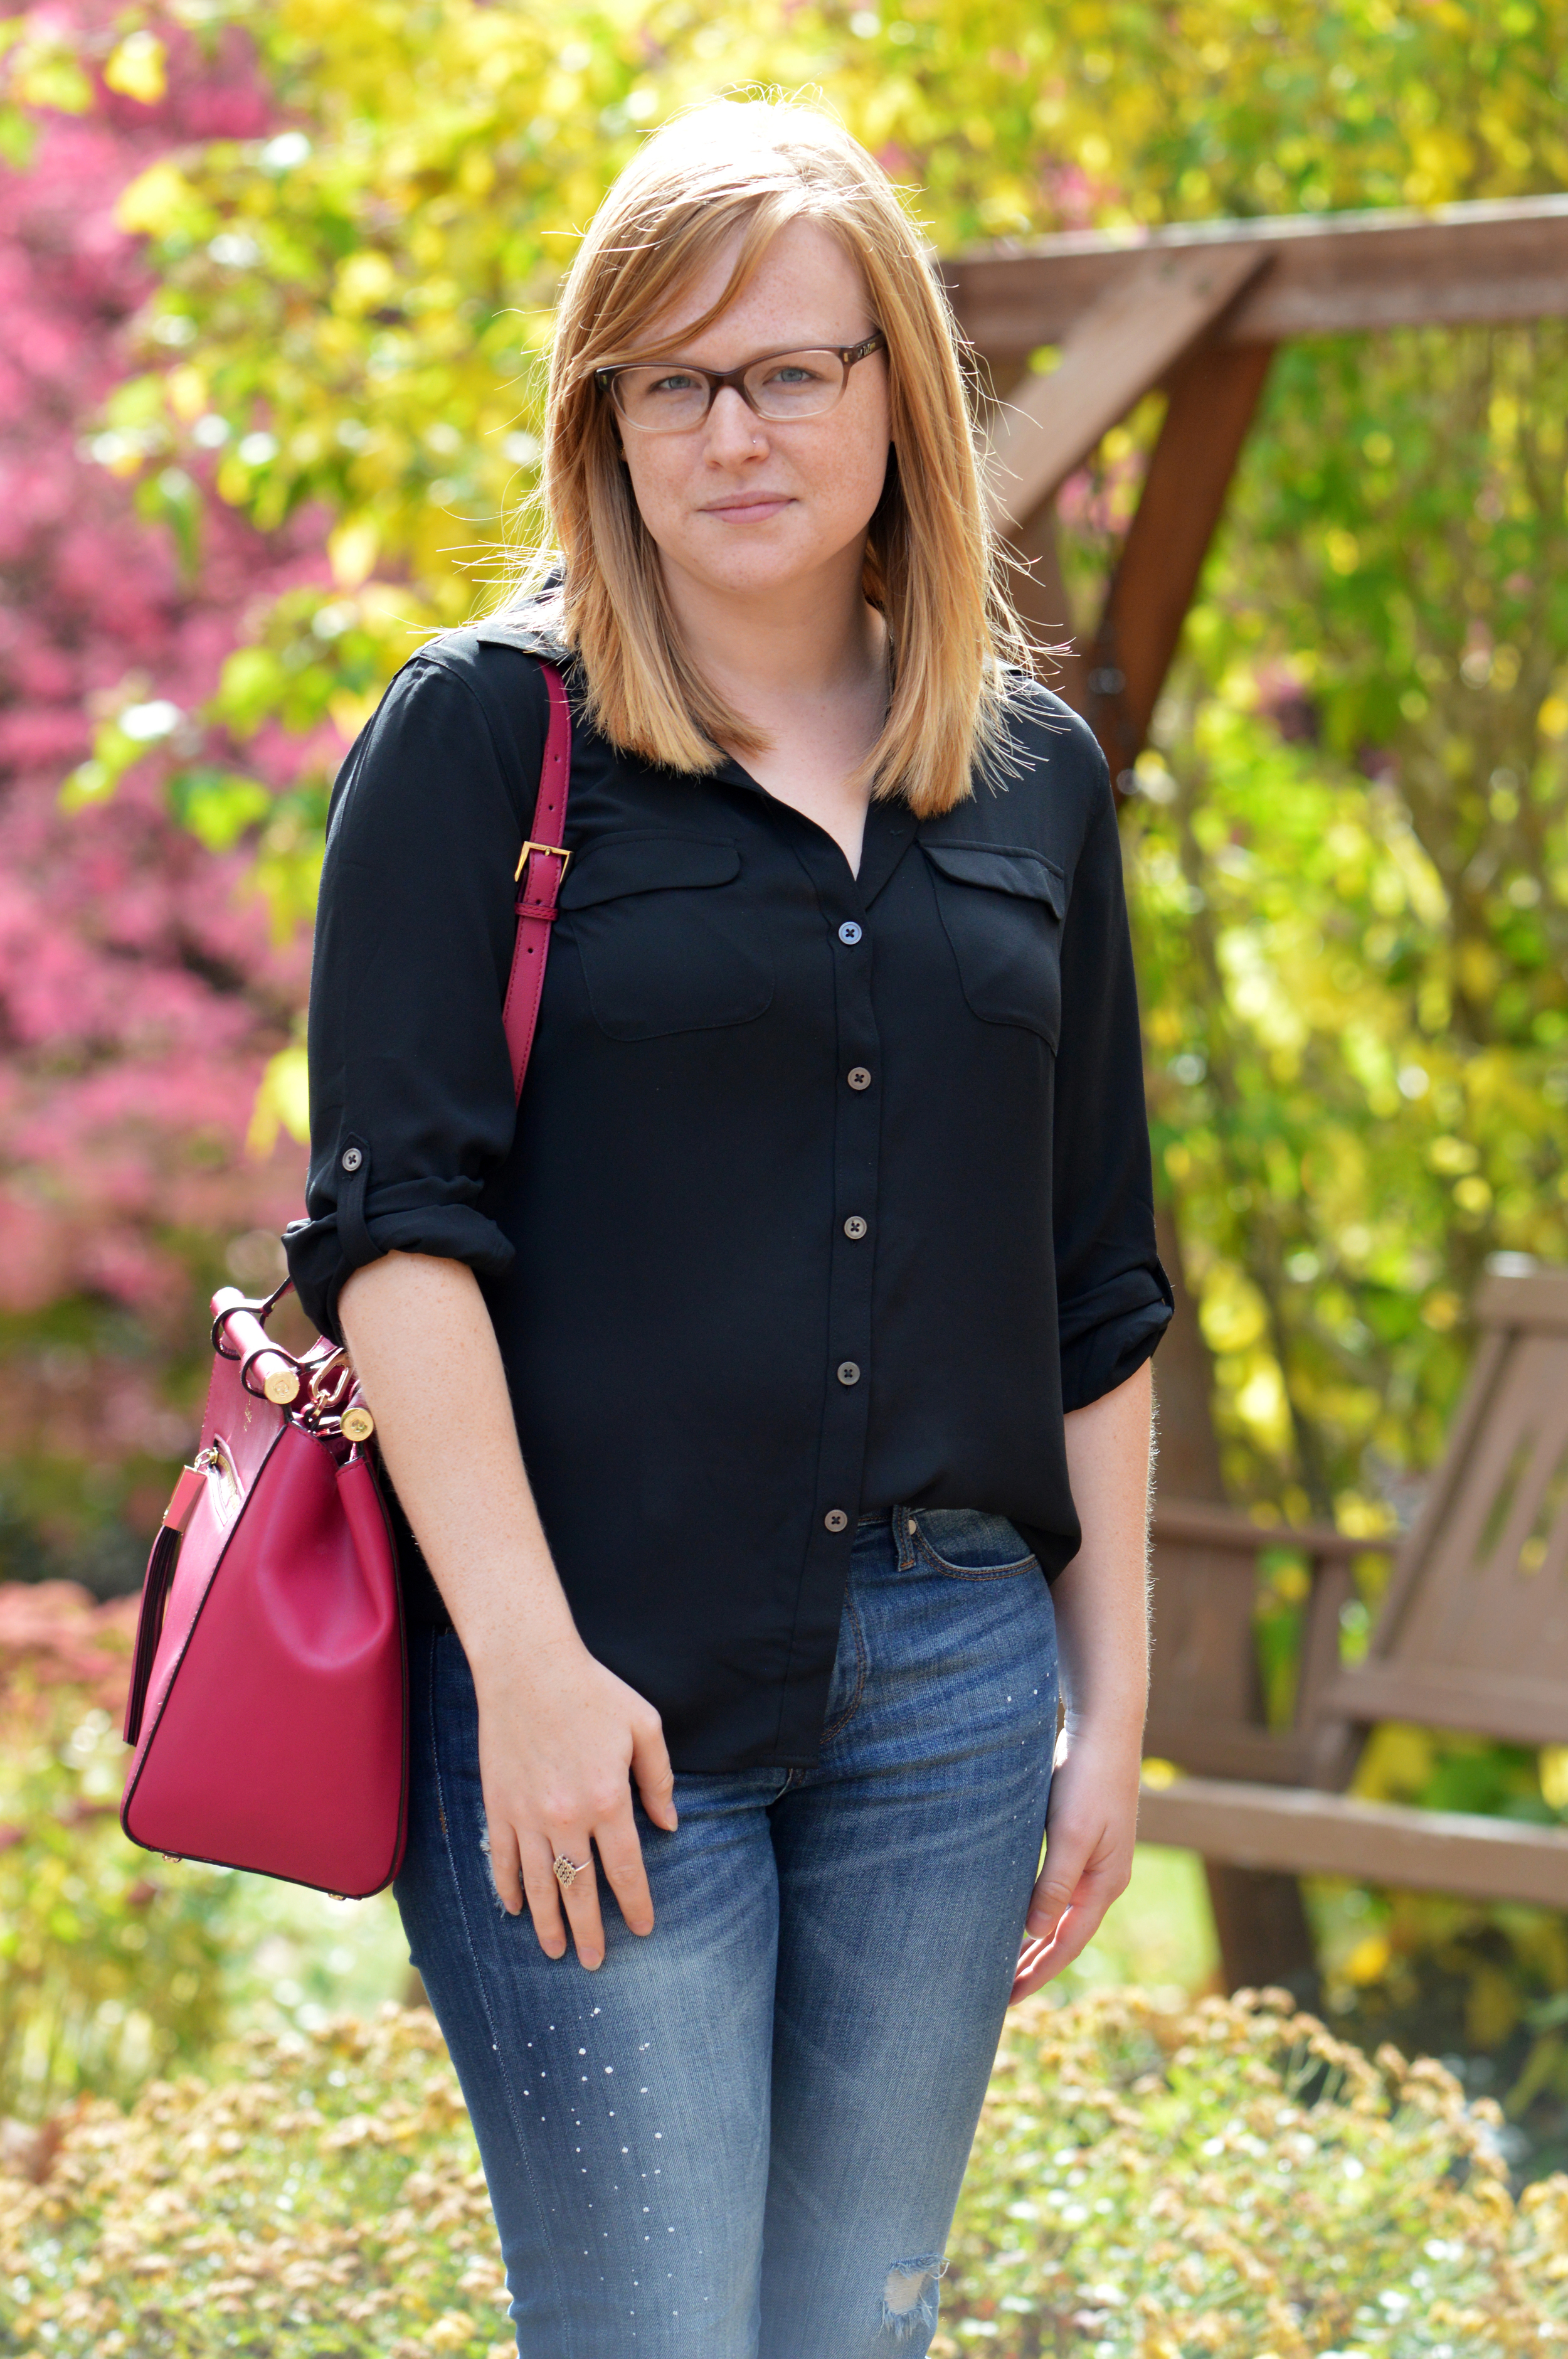 Maggie a la Mode - Ann Taylor LOFT Utility Blouse, Banana Republic distressed jeans, Anthropologie boots, Kate Spade satchel